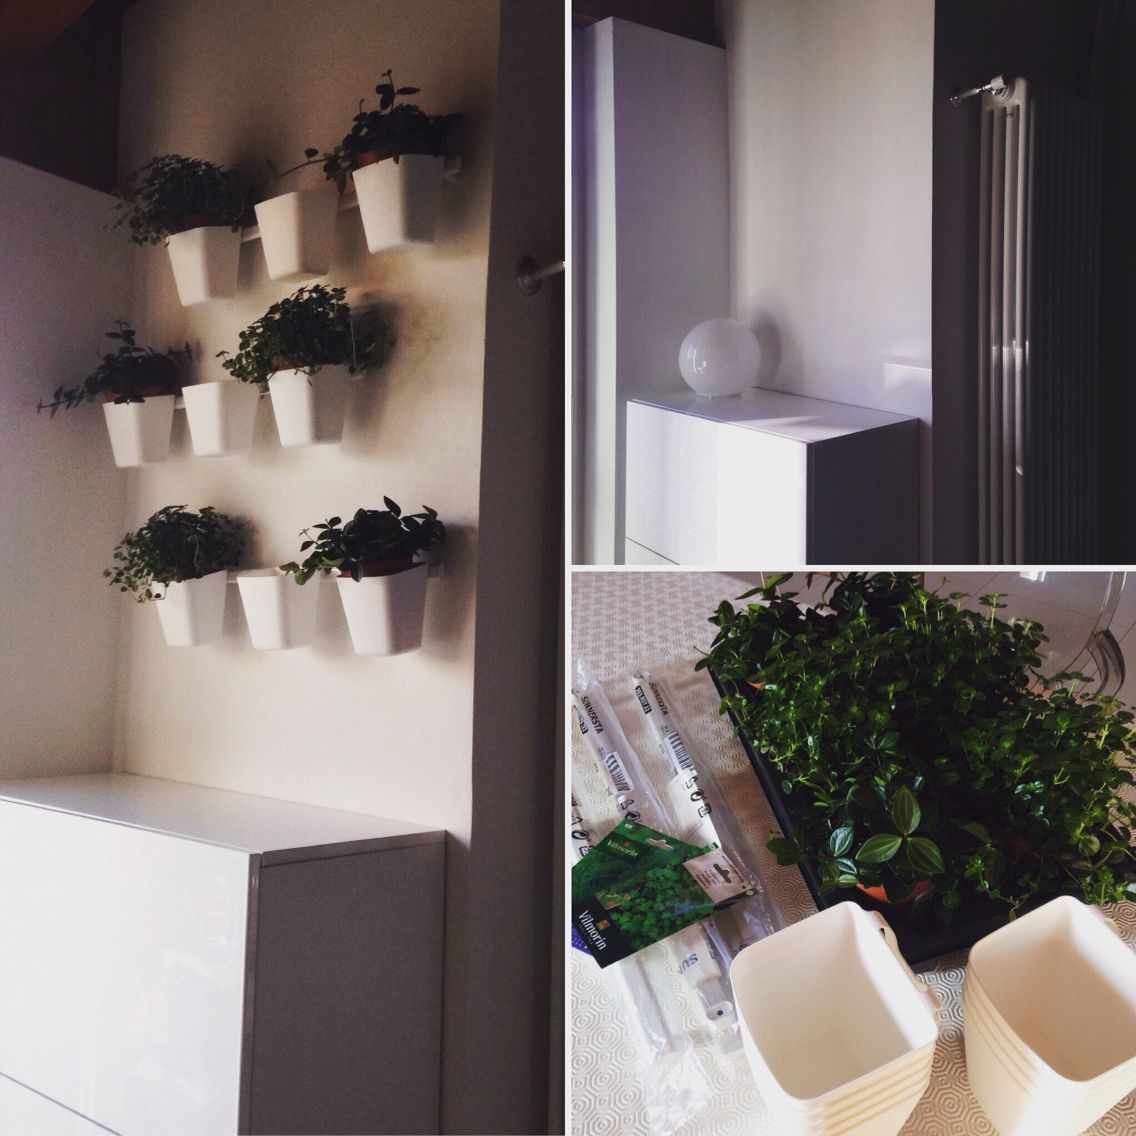 Binario Pensili Cucina Ikea a green corner @ home less than 30€. is possible with